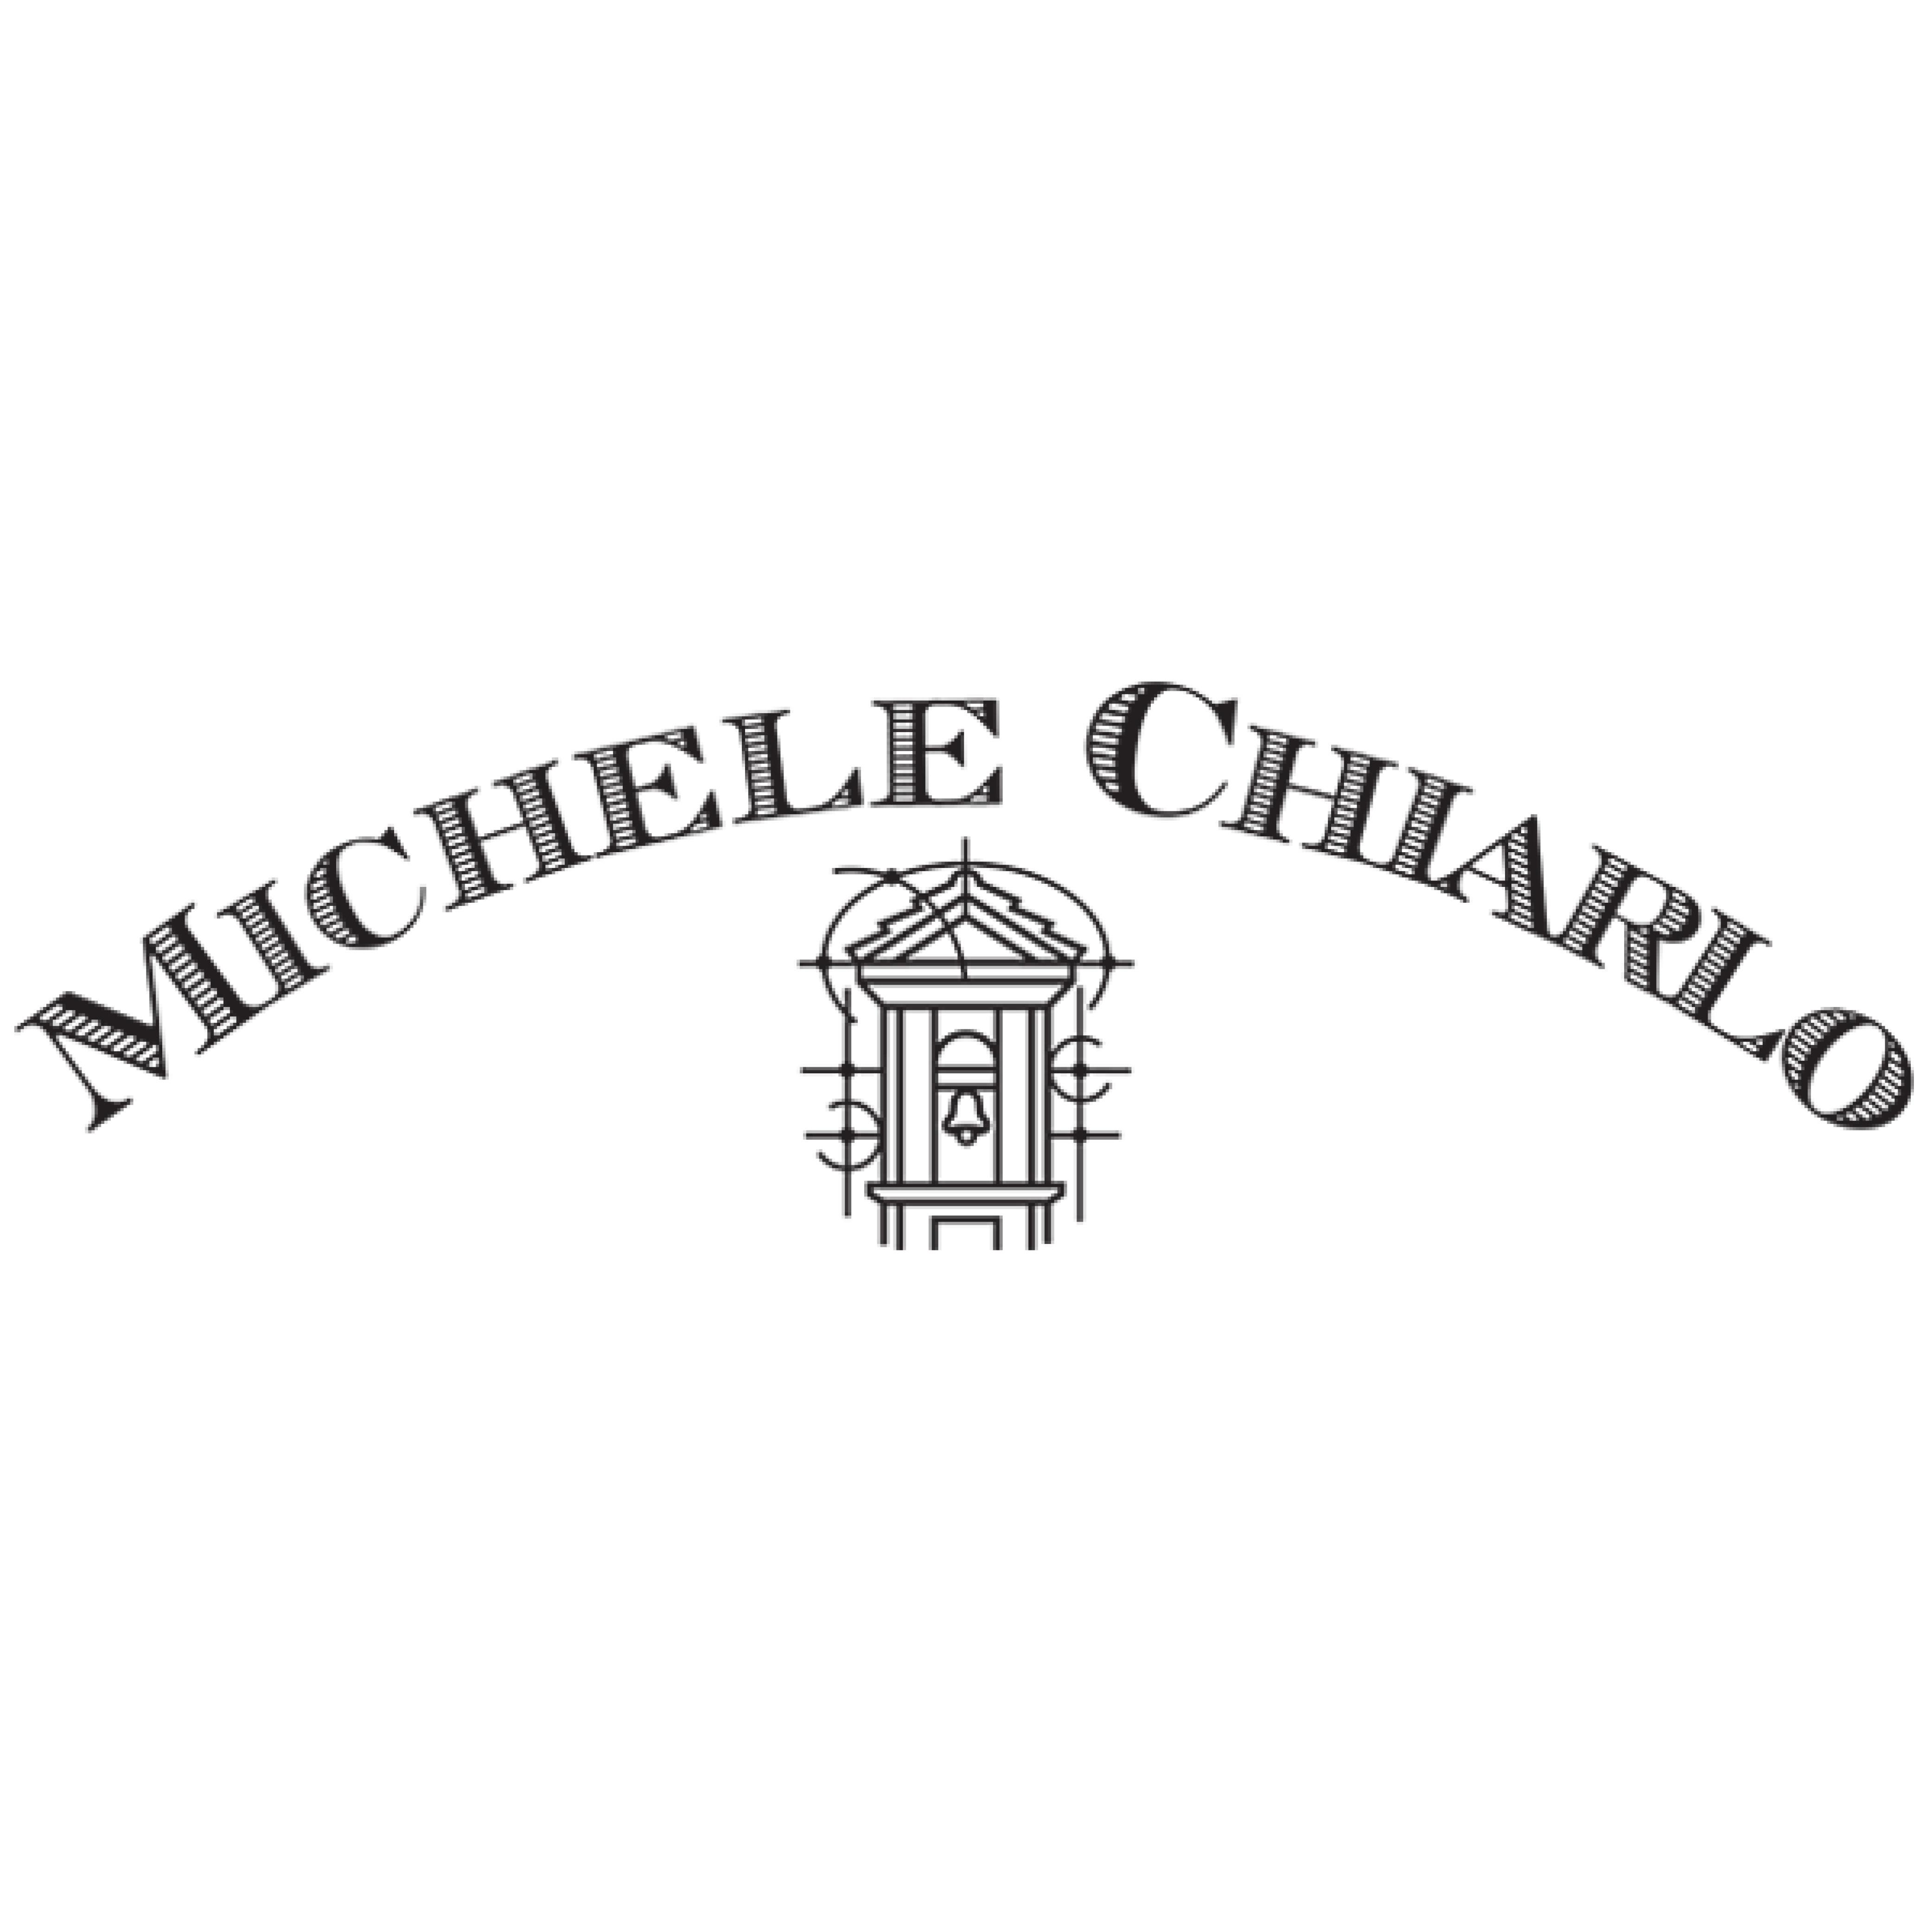 Michele Chiarlo a Vinòforum Class